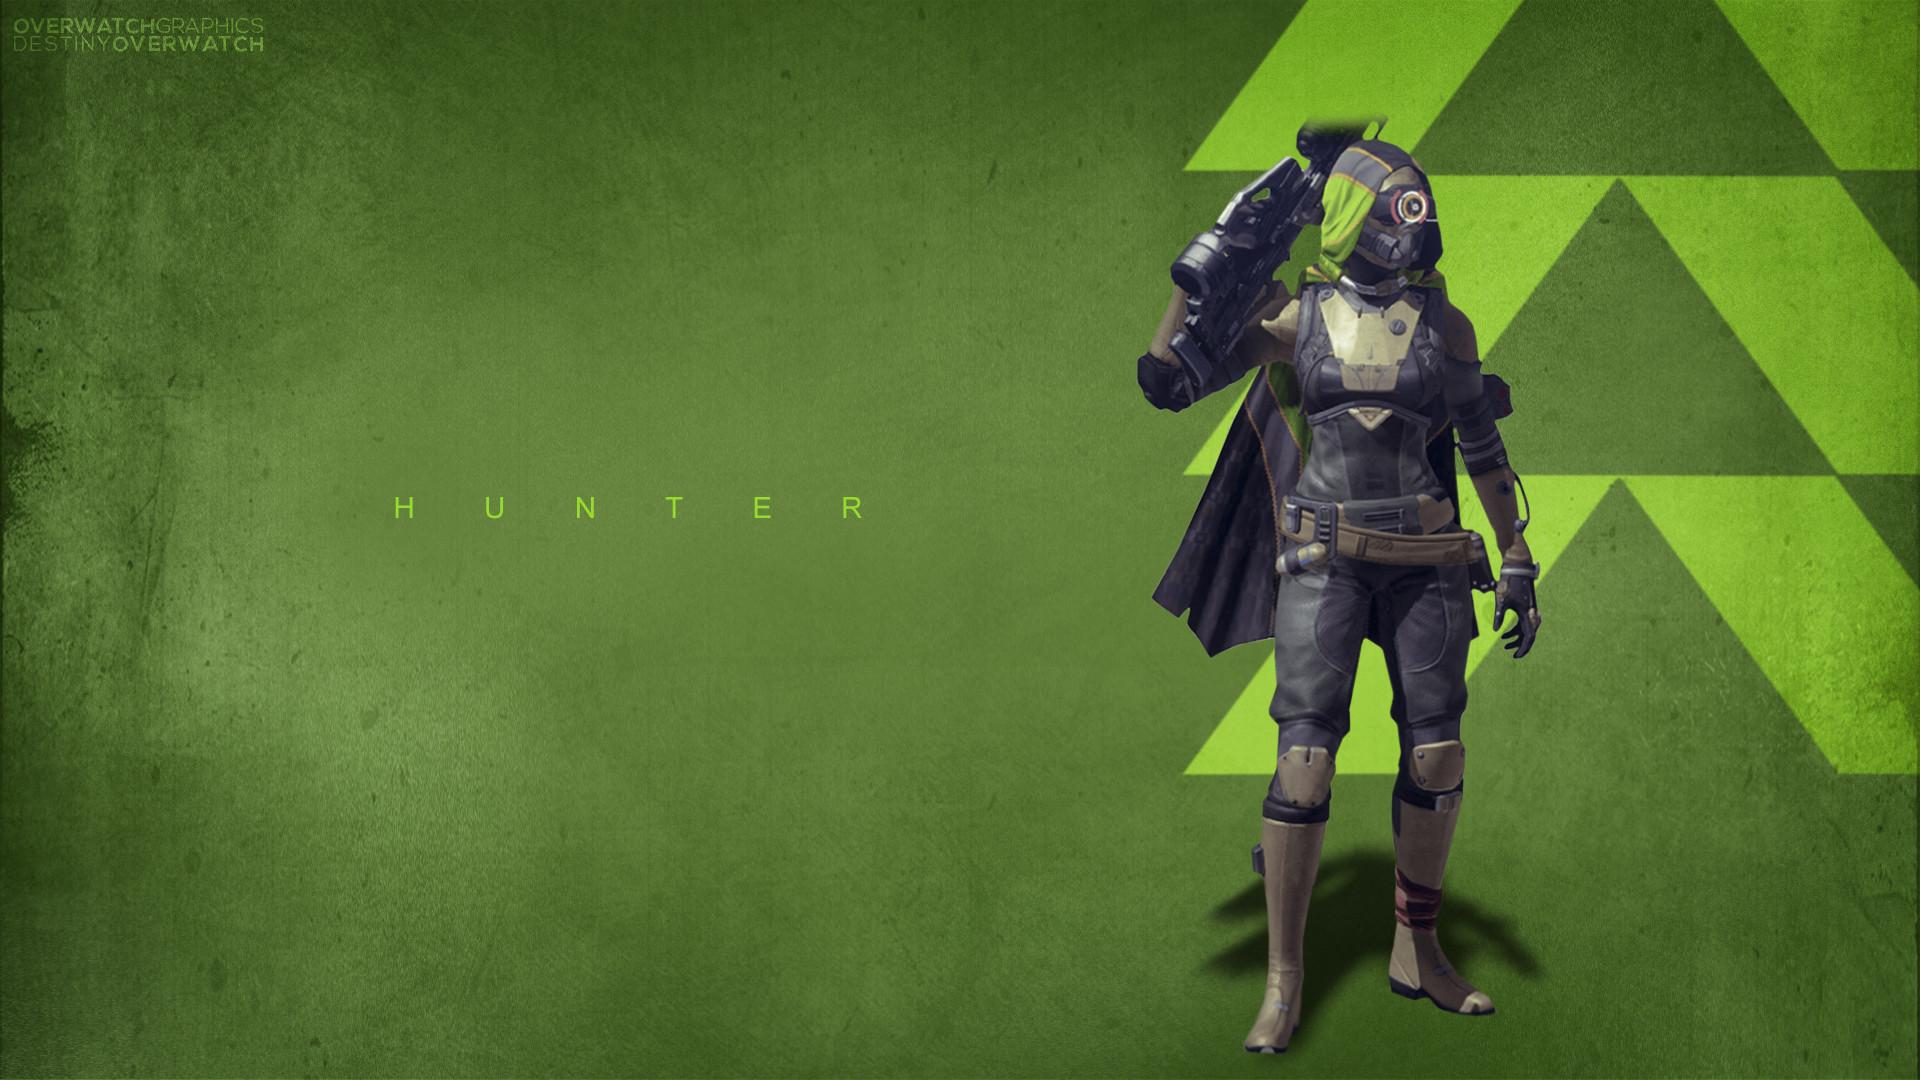 Destiny – Hunter Wallpaper by OverwatchGraphics Destiny – Hunter Wallpaper  by OverwatchGraphics